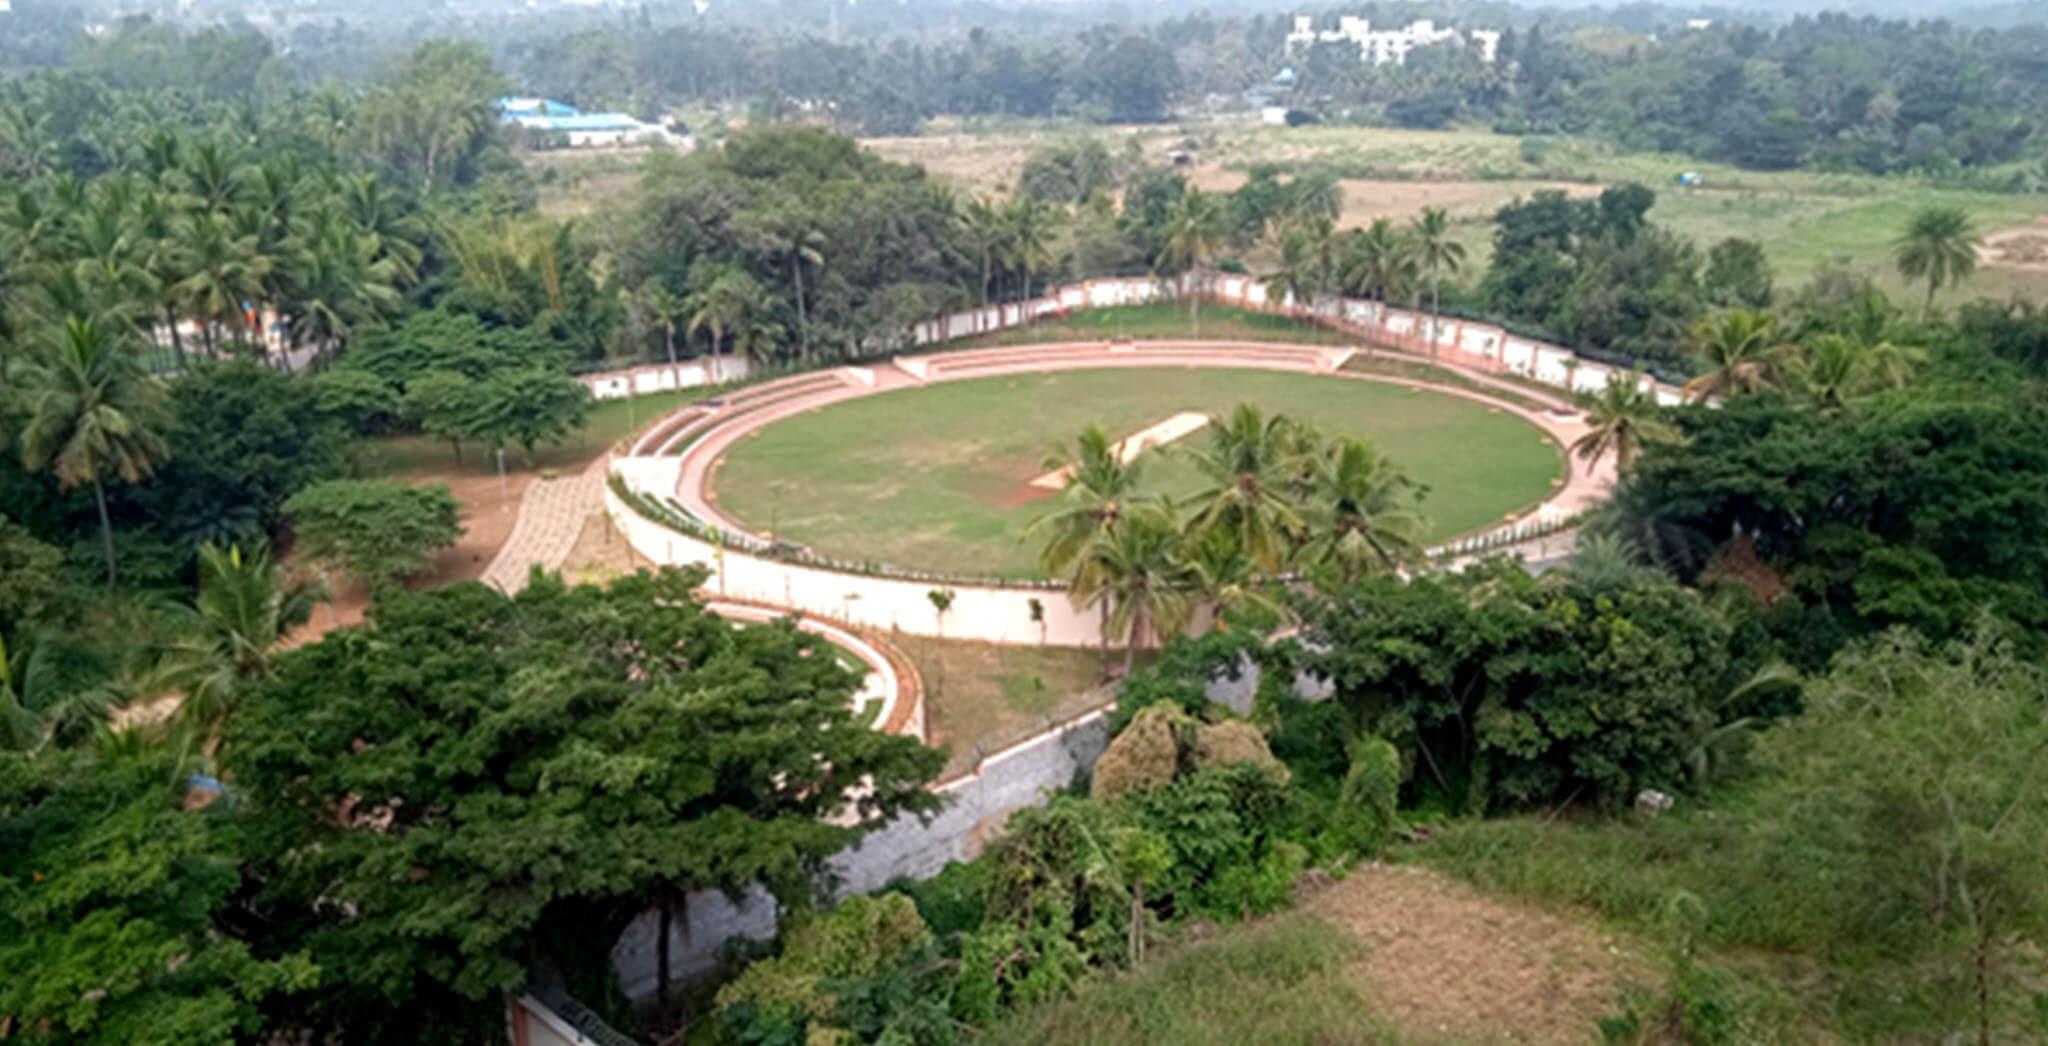 Dec 2020 - Cricket pitch